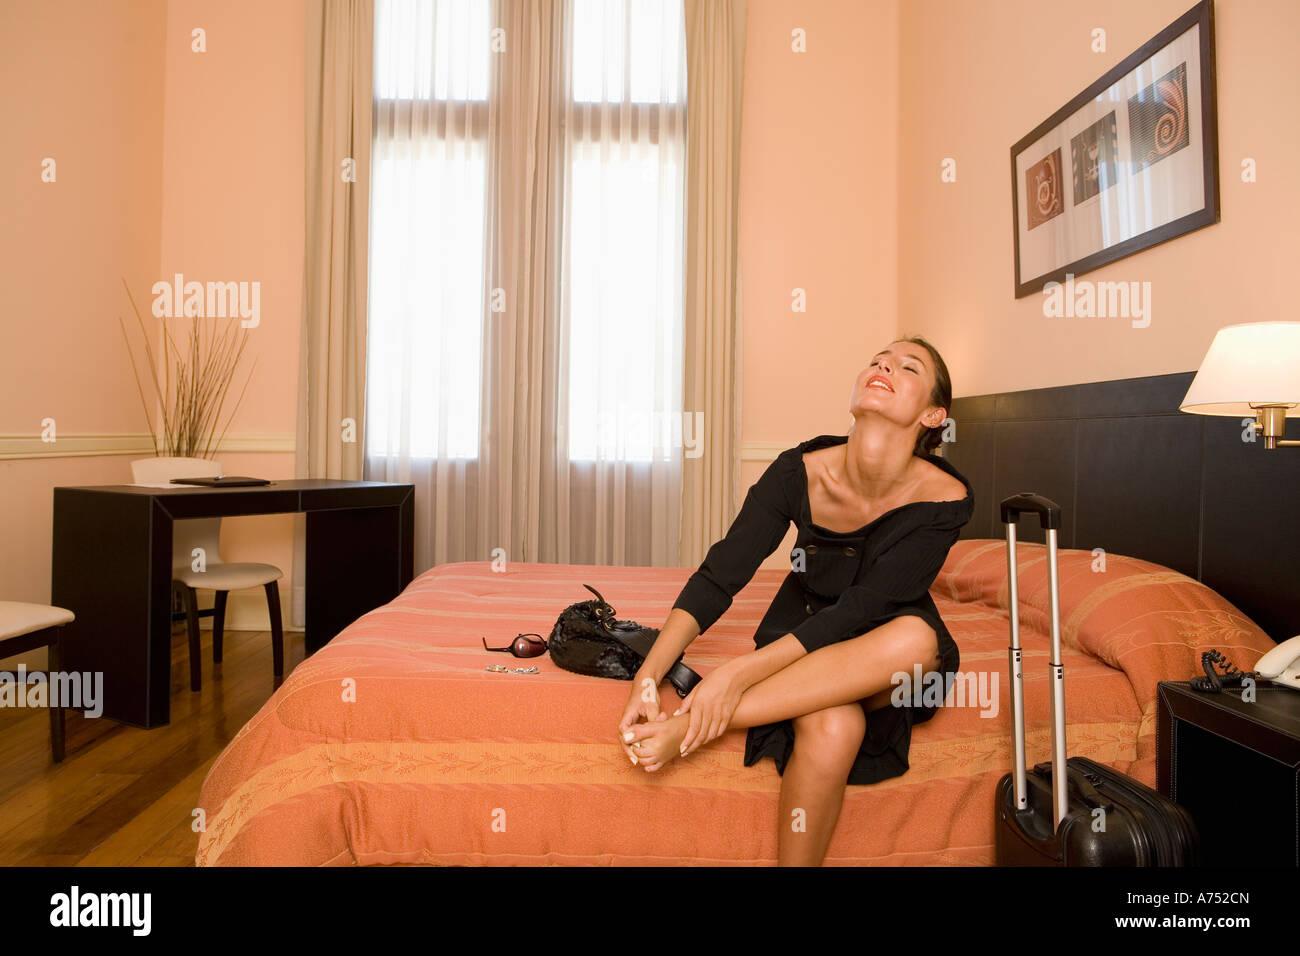 Businesswoman rubbing her feet in hotel room Stock Photo